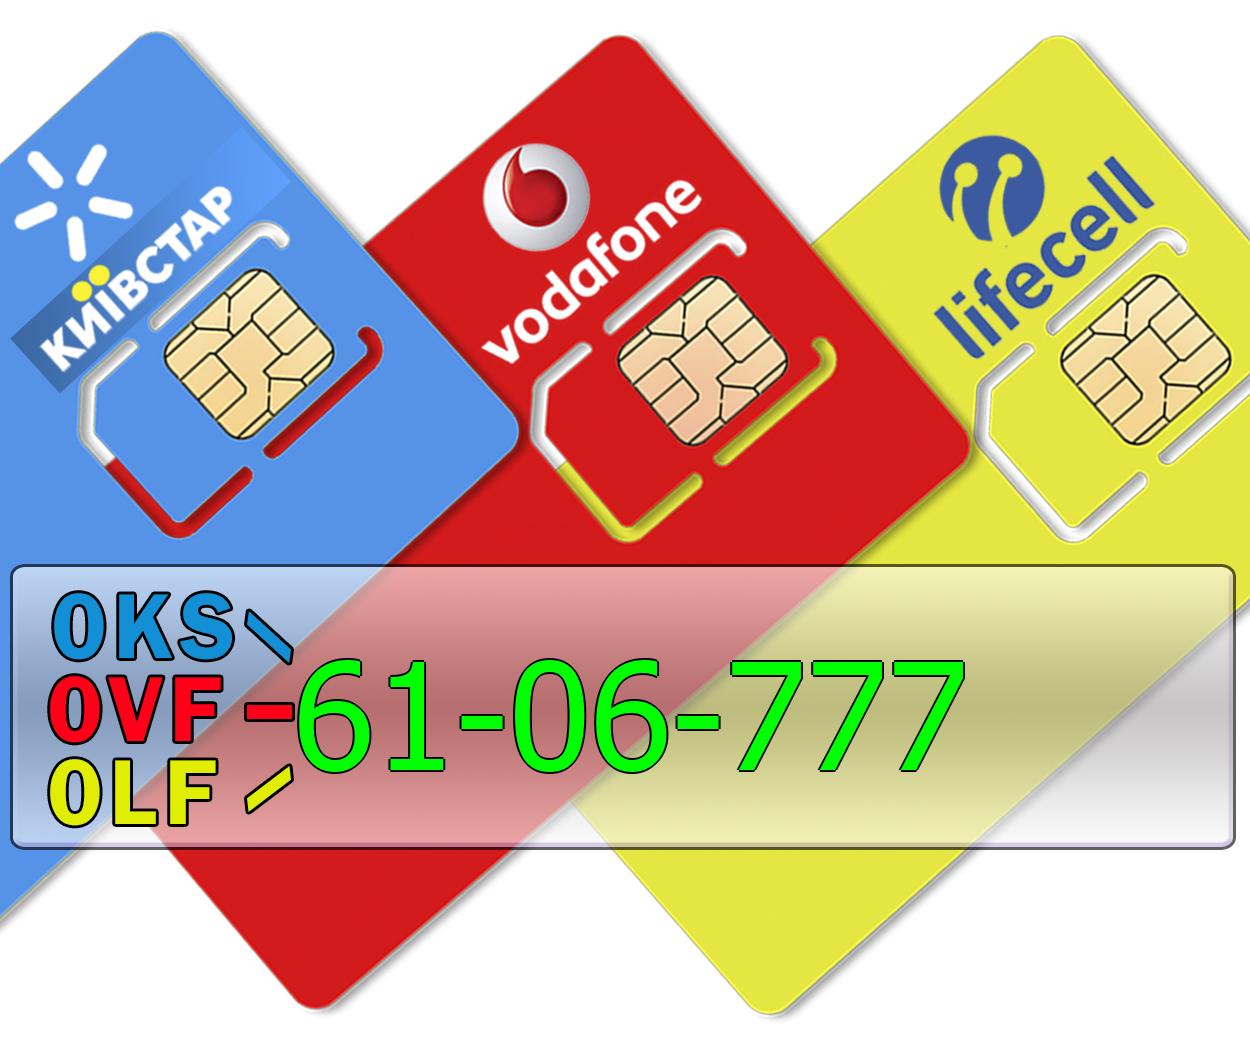 Тріо 0KS-61-06-777 0LF-61-06-777 0VF-61-06-777 Київстар, lifecell, Vodafone